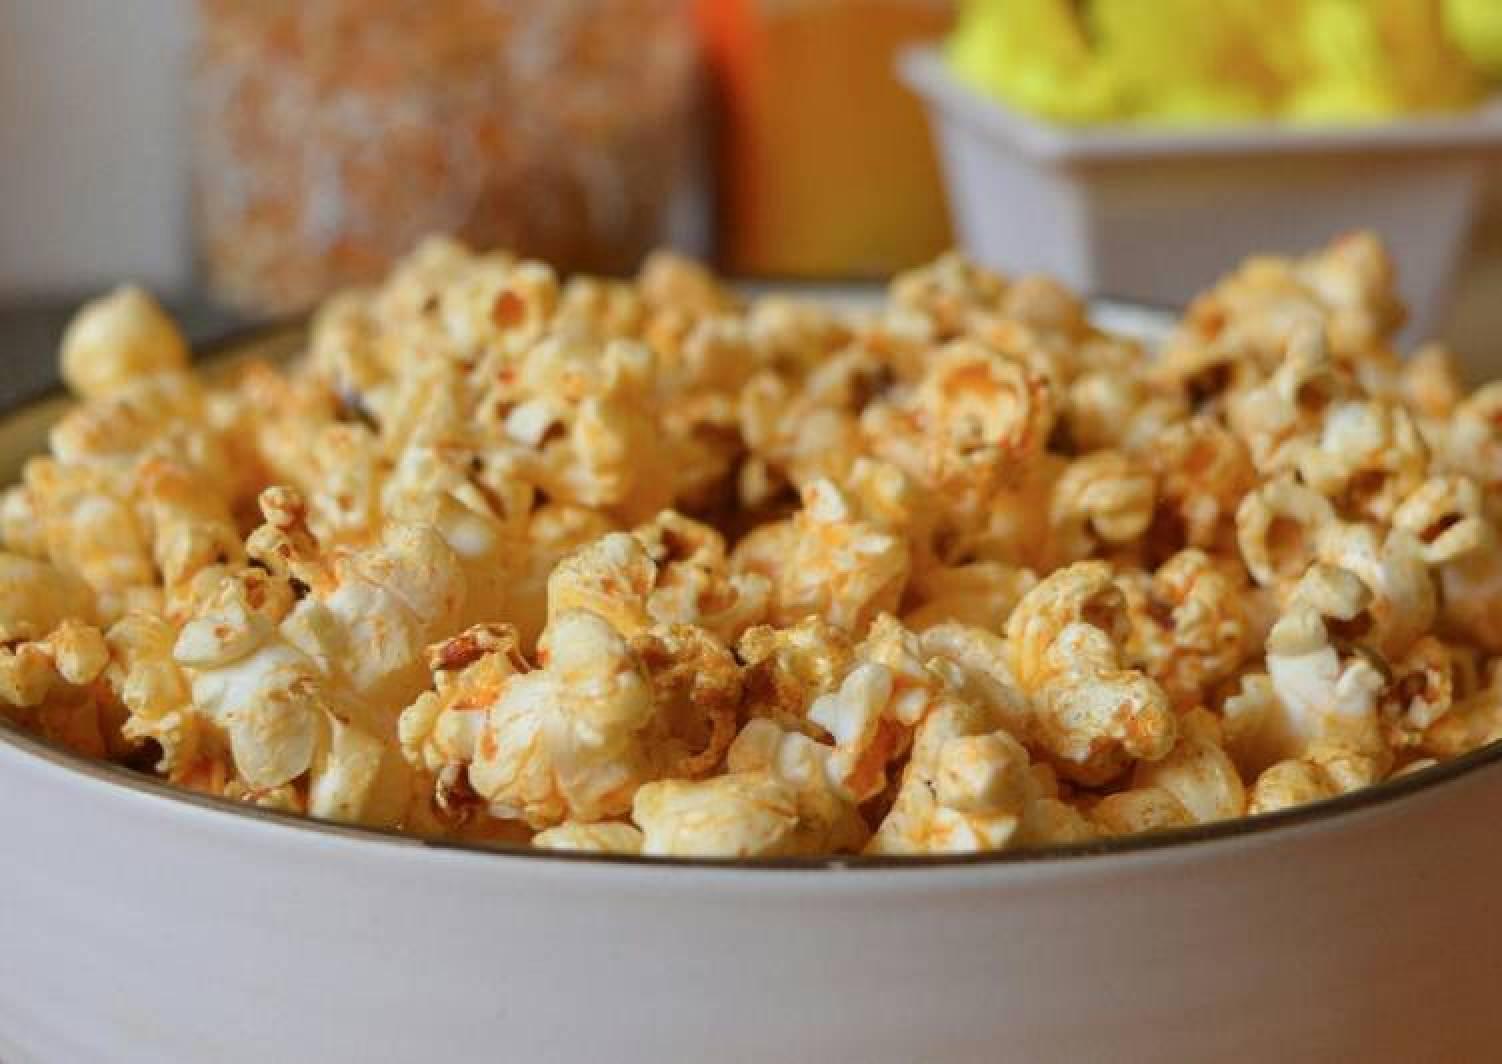 Paprika&Lime stovetop popcorns #CHARITYRECIPE